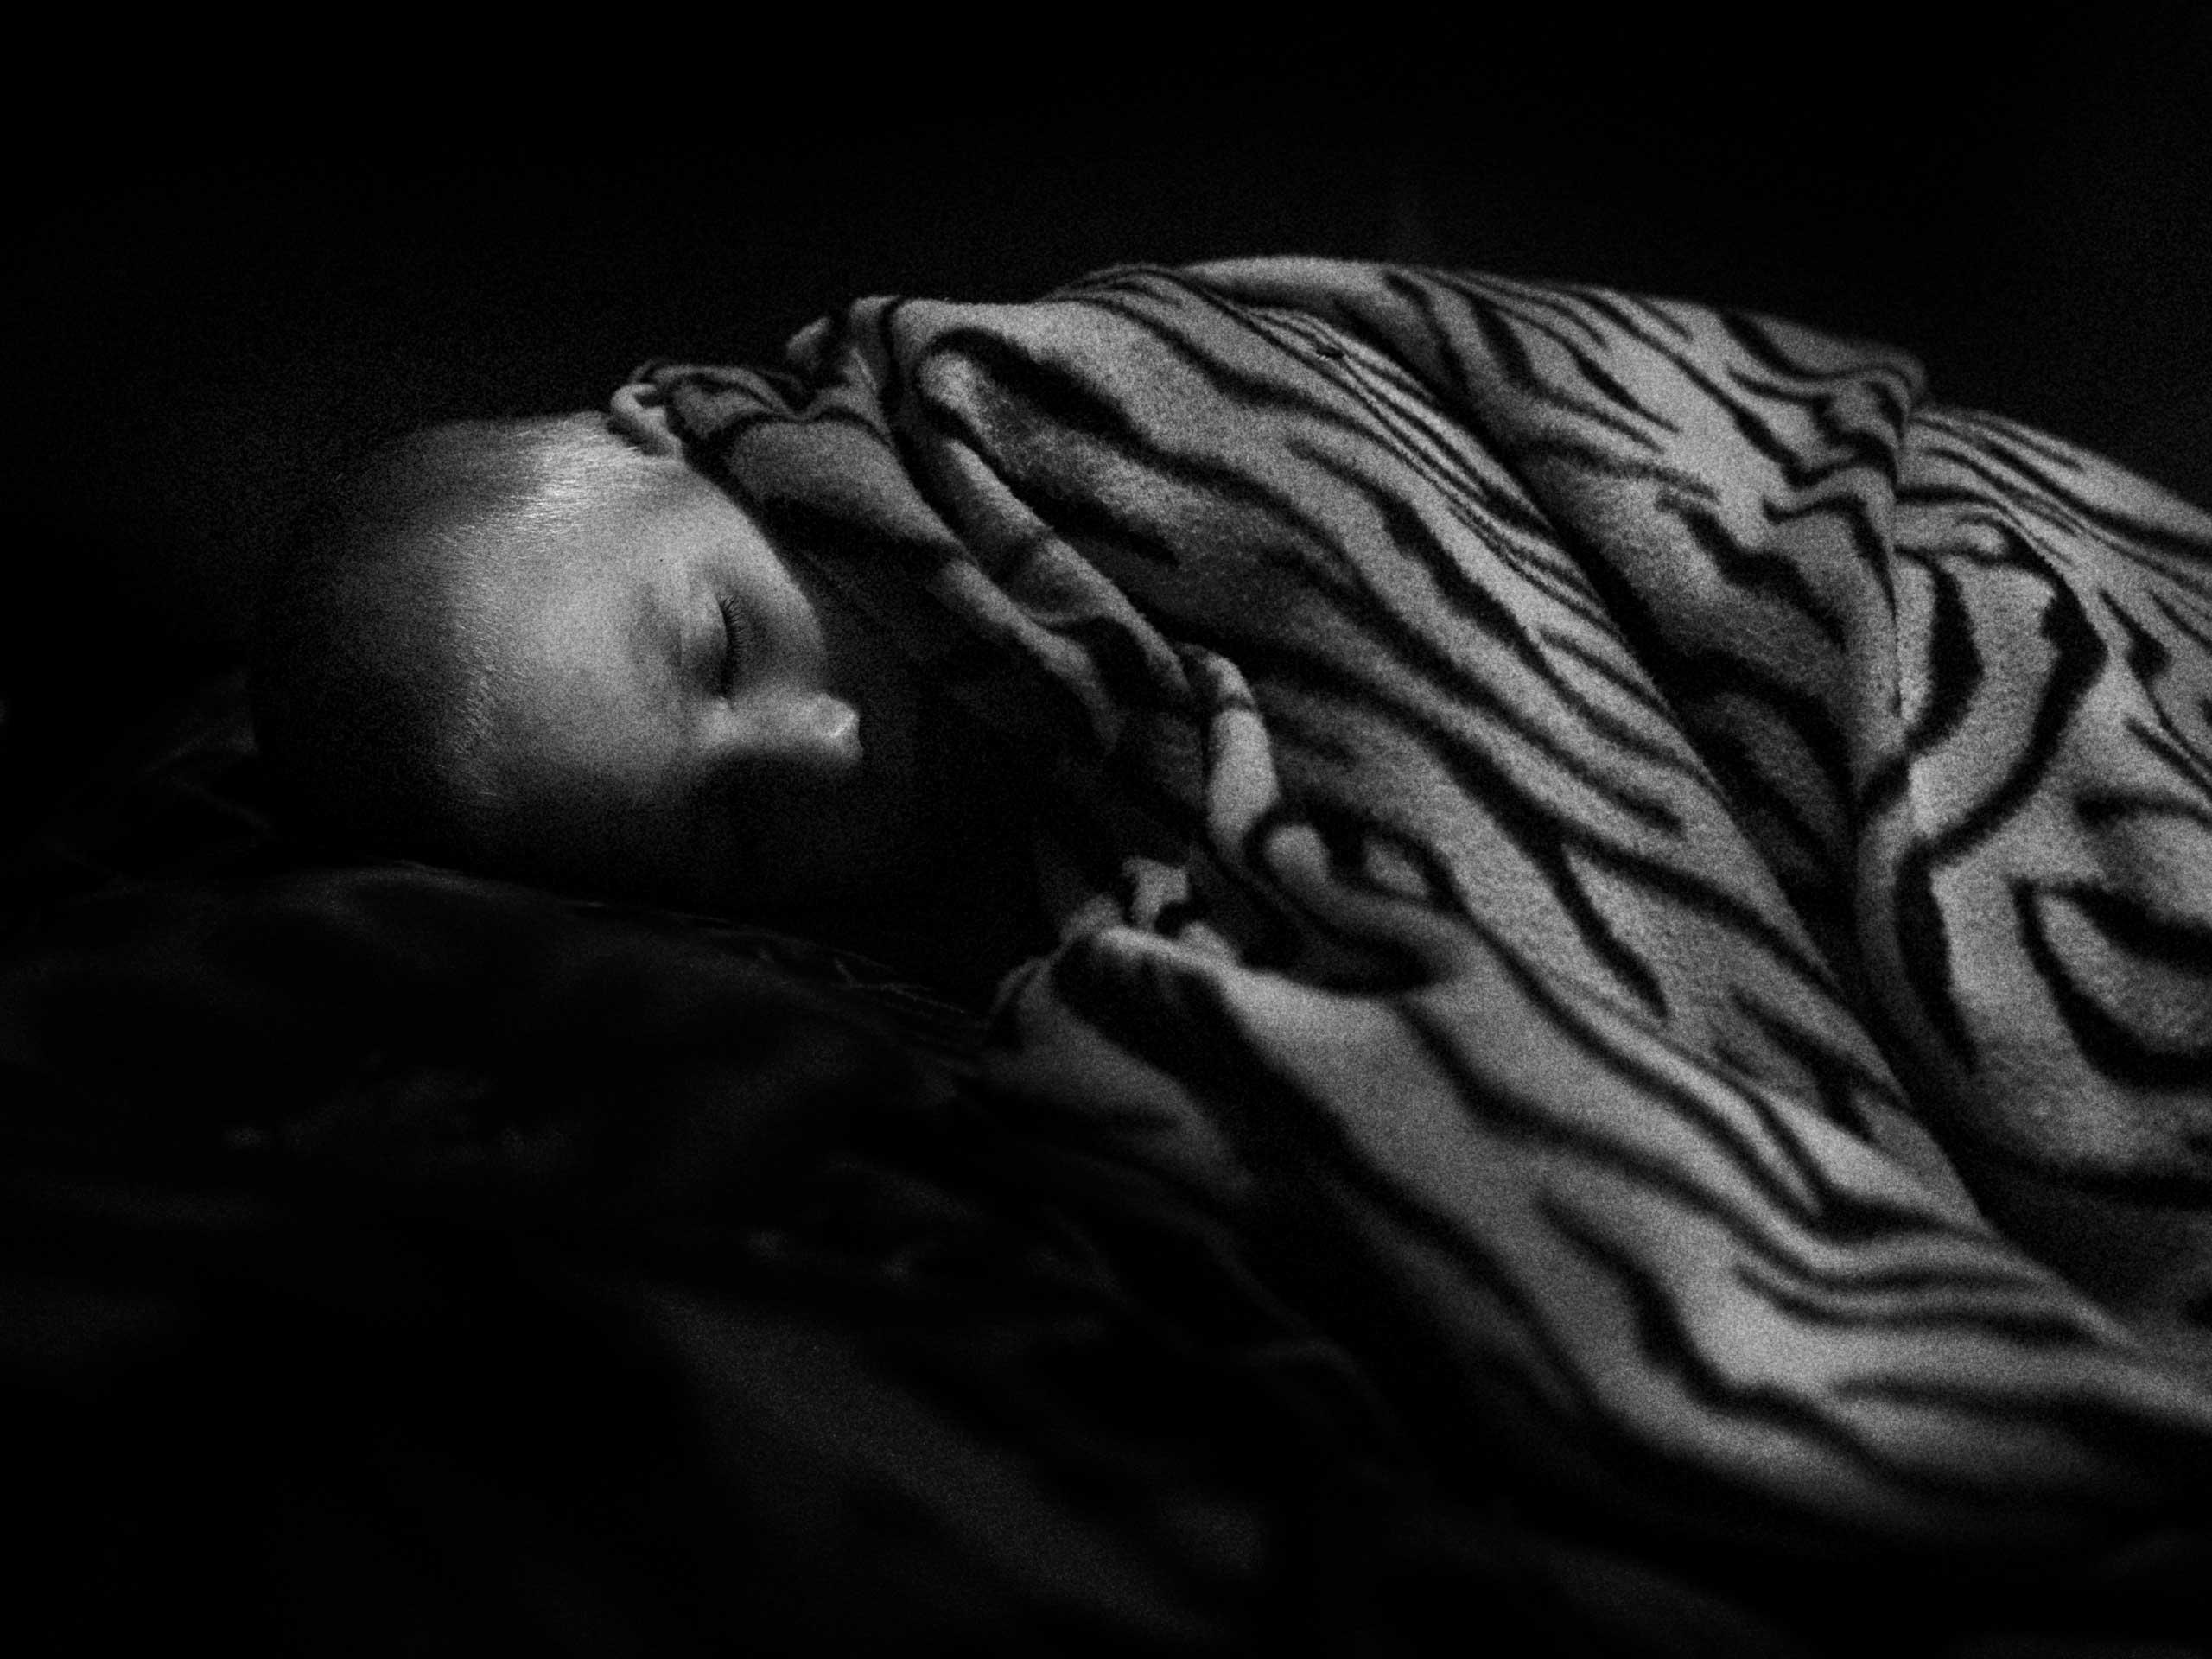 A child sleeps during the afternoon in the Trudovski shelter. Trudovski, Donetsk Oblast, Ukraine. Oct. 18, 2014.